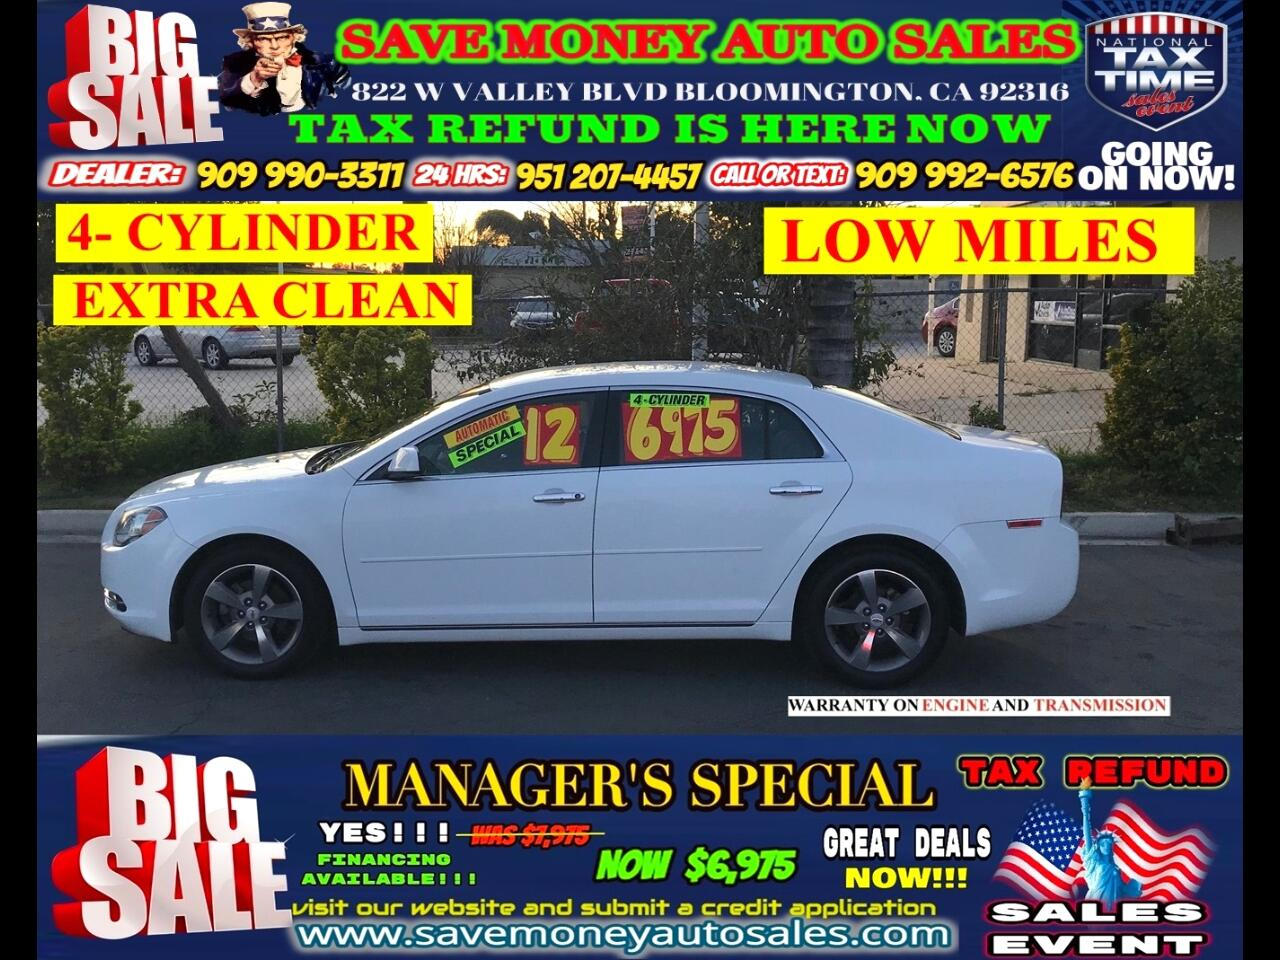 2012 Chevrolet Malibu LT>LOW MILES>USB>EXTRA CLEAN>